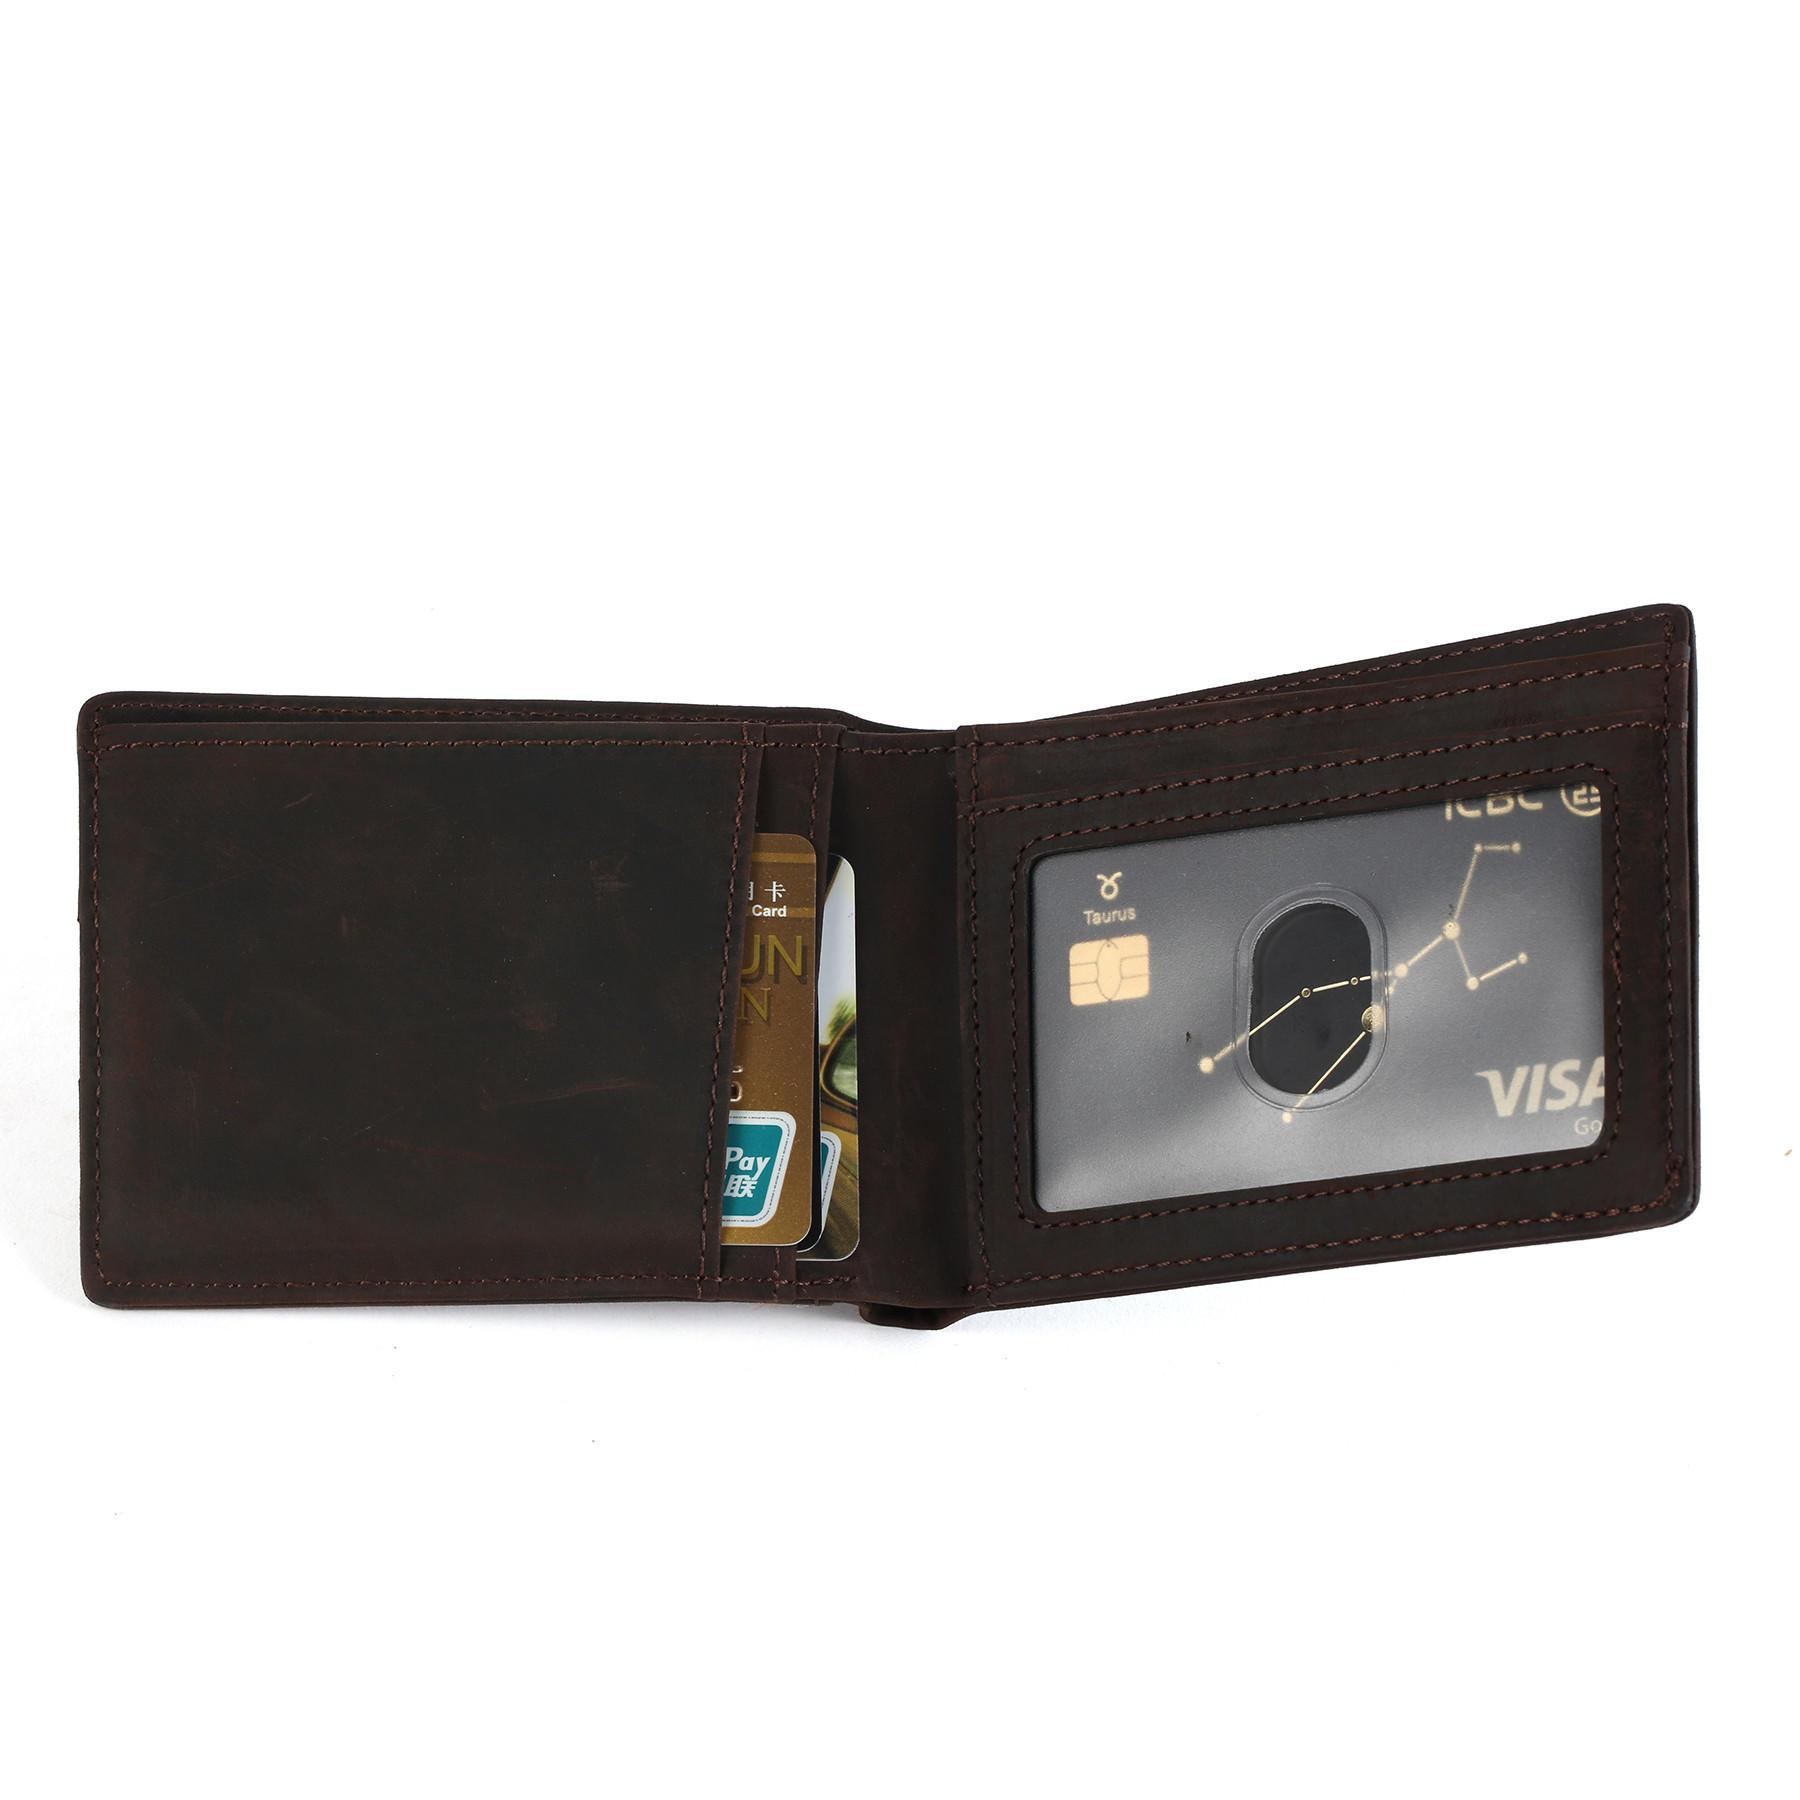 RFID Blocking Slim Bifold Genuine Leather Thin Minimalist Front Pocket Wallets LT-BMM019